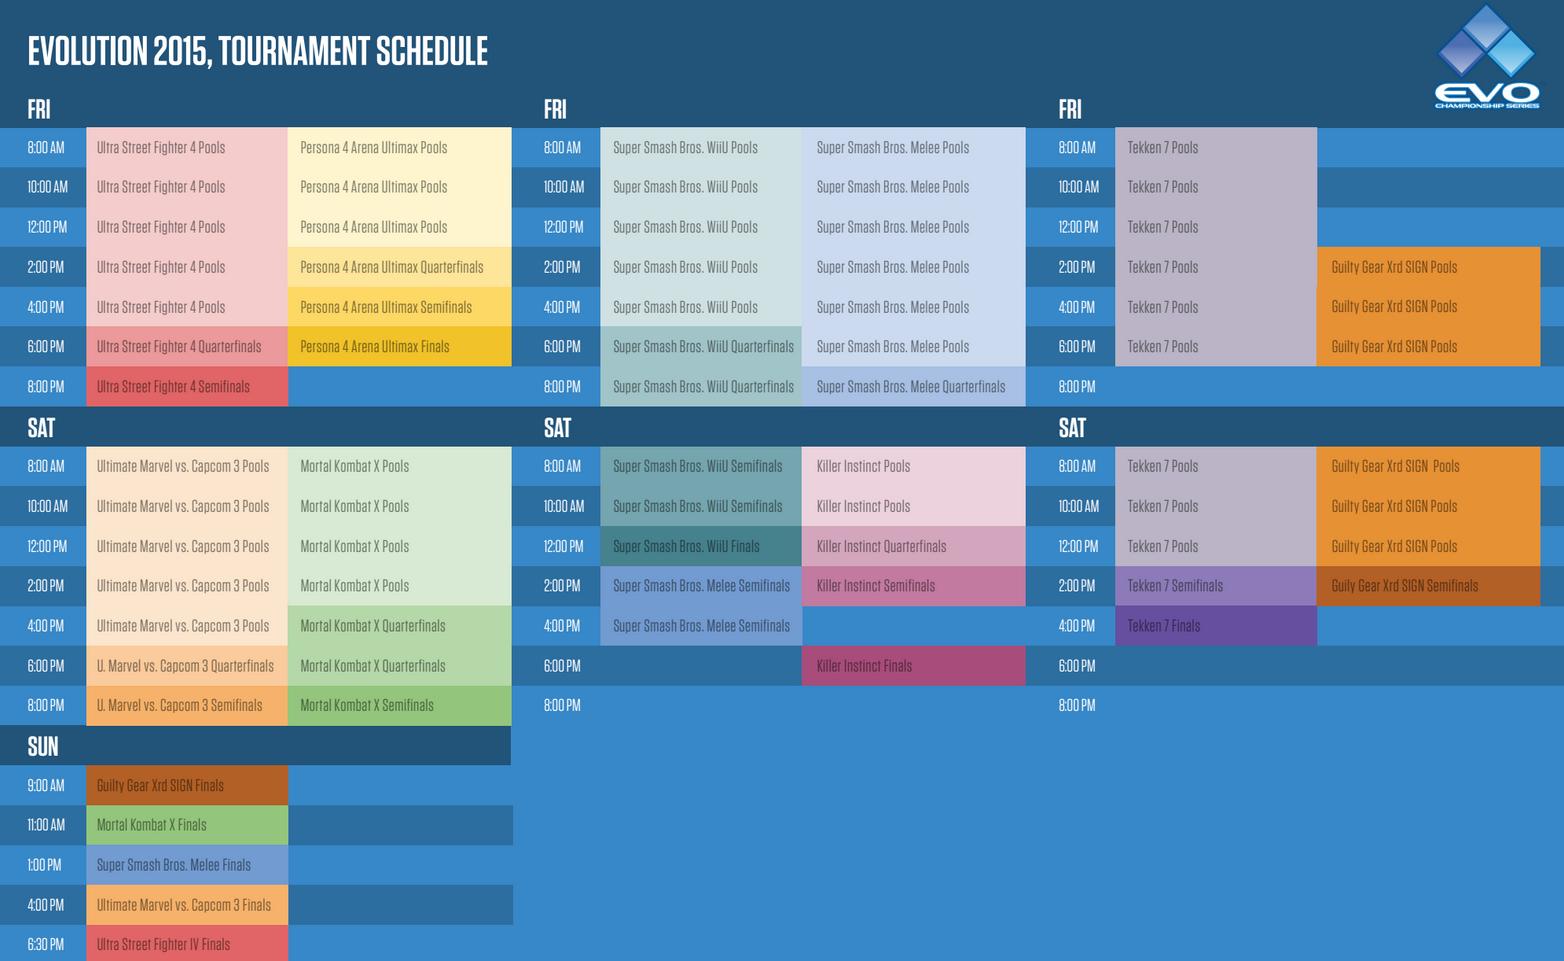 EVO 2015 schedule